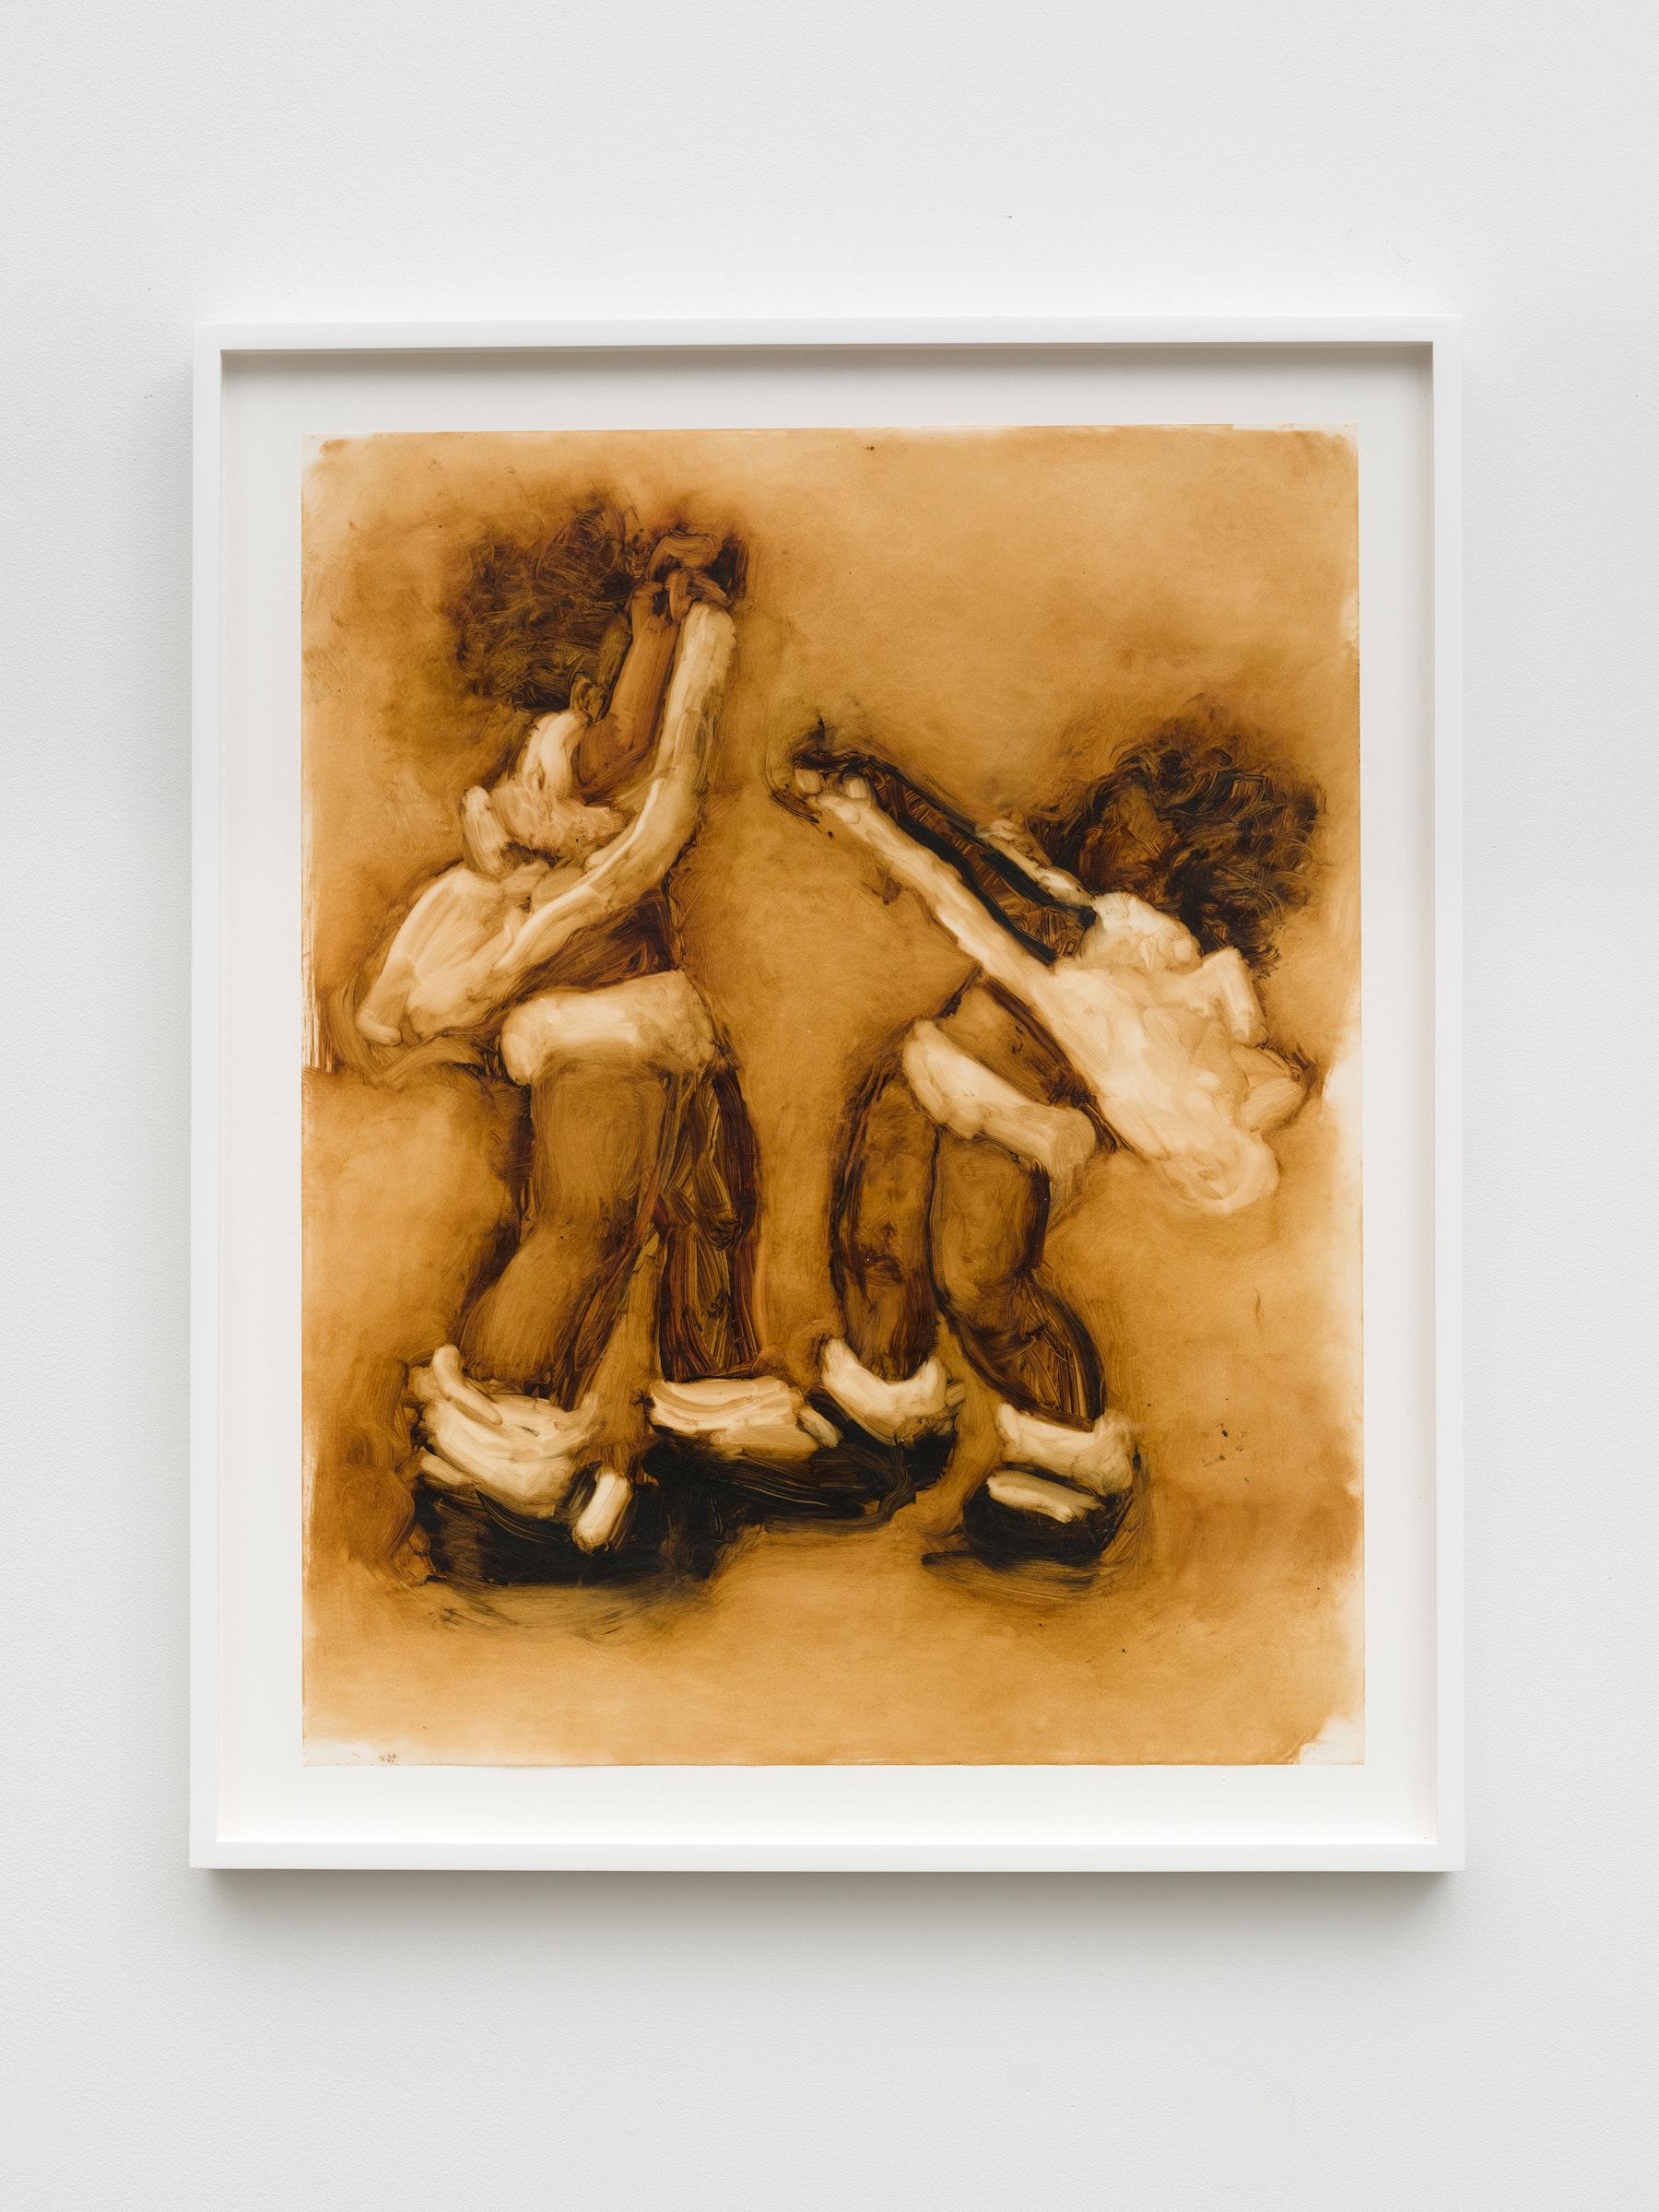 "Kim Dingle ""Untitled,"" 2001 Oil on vellum 19"" x 24"" [HxW] (48.26 x 60.96 cm) paper size; 27 ³⁄₄"" x 22 ³⁄₄"" x 1 ¹⁄₂"" [HxWxD] (70.48 x 57.78 x 3.81 cm) framed Inventory #DIN311 Courtesy of Vielmetter Los Angeles Photo credit: Jeff McLane"